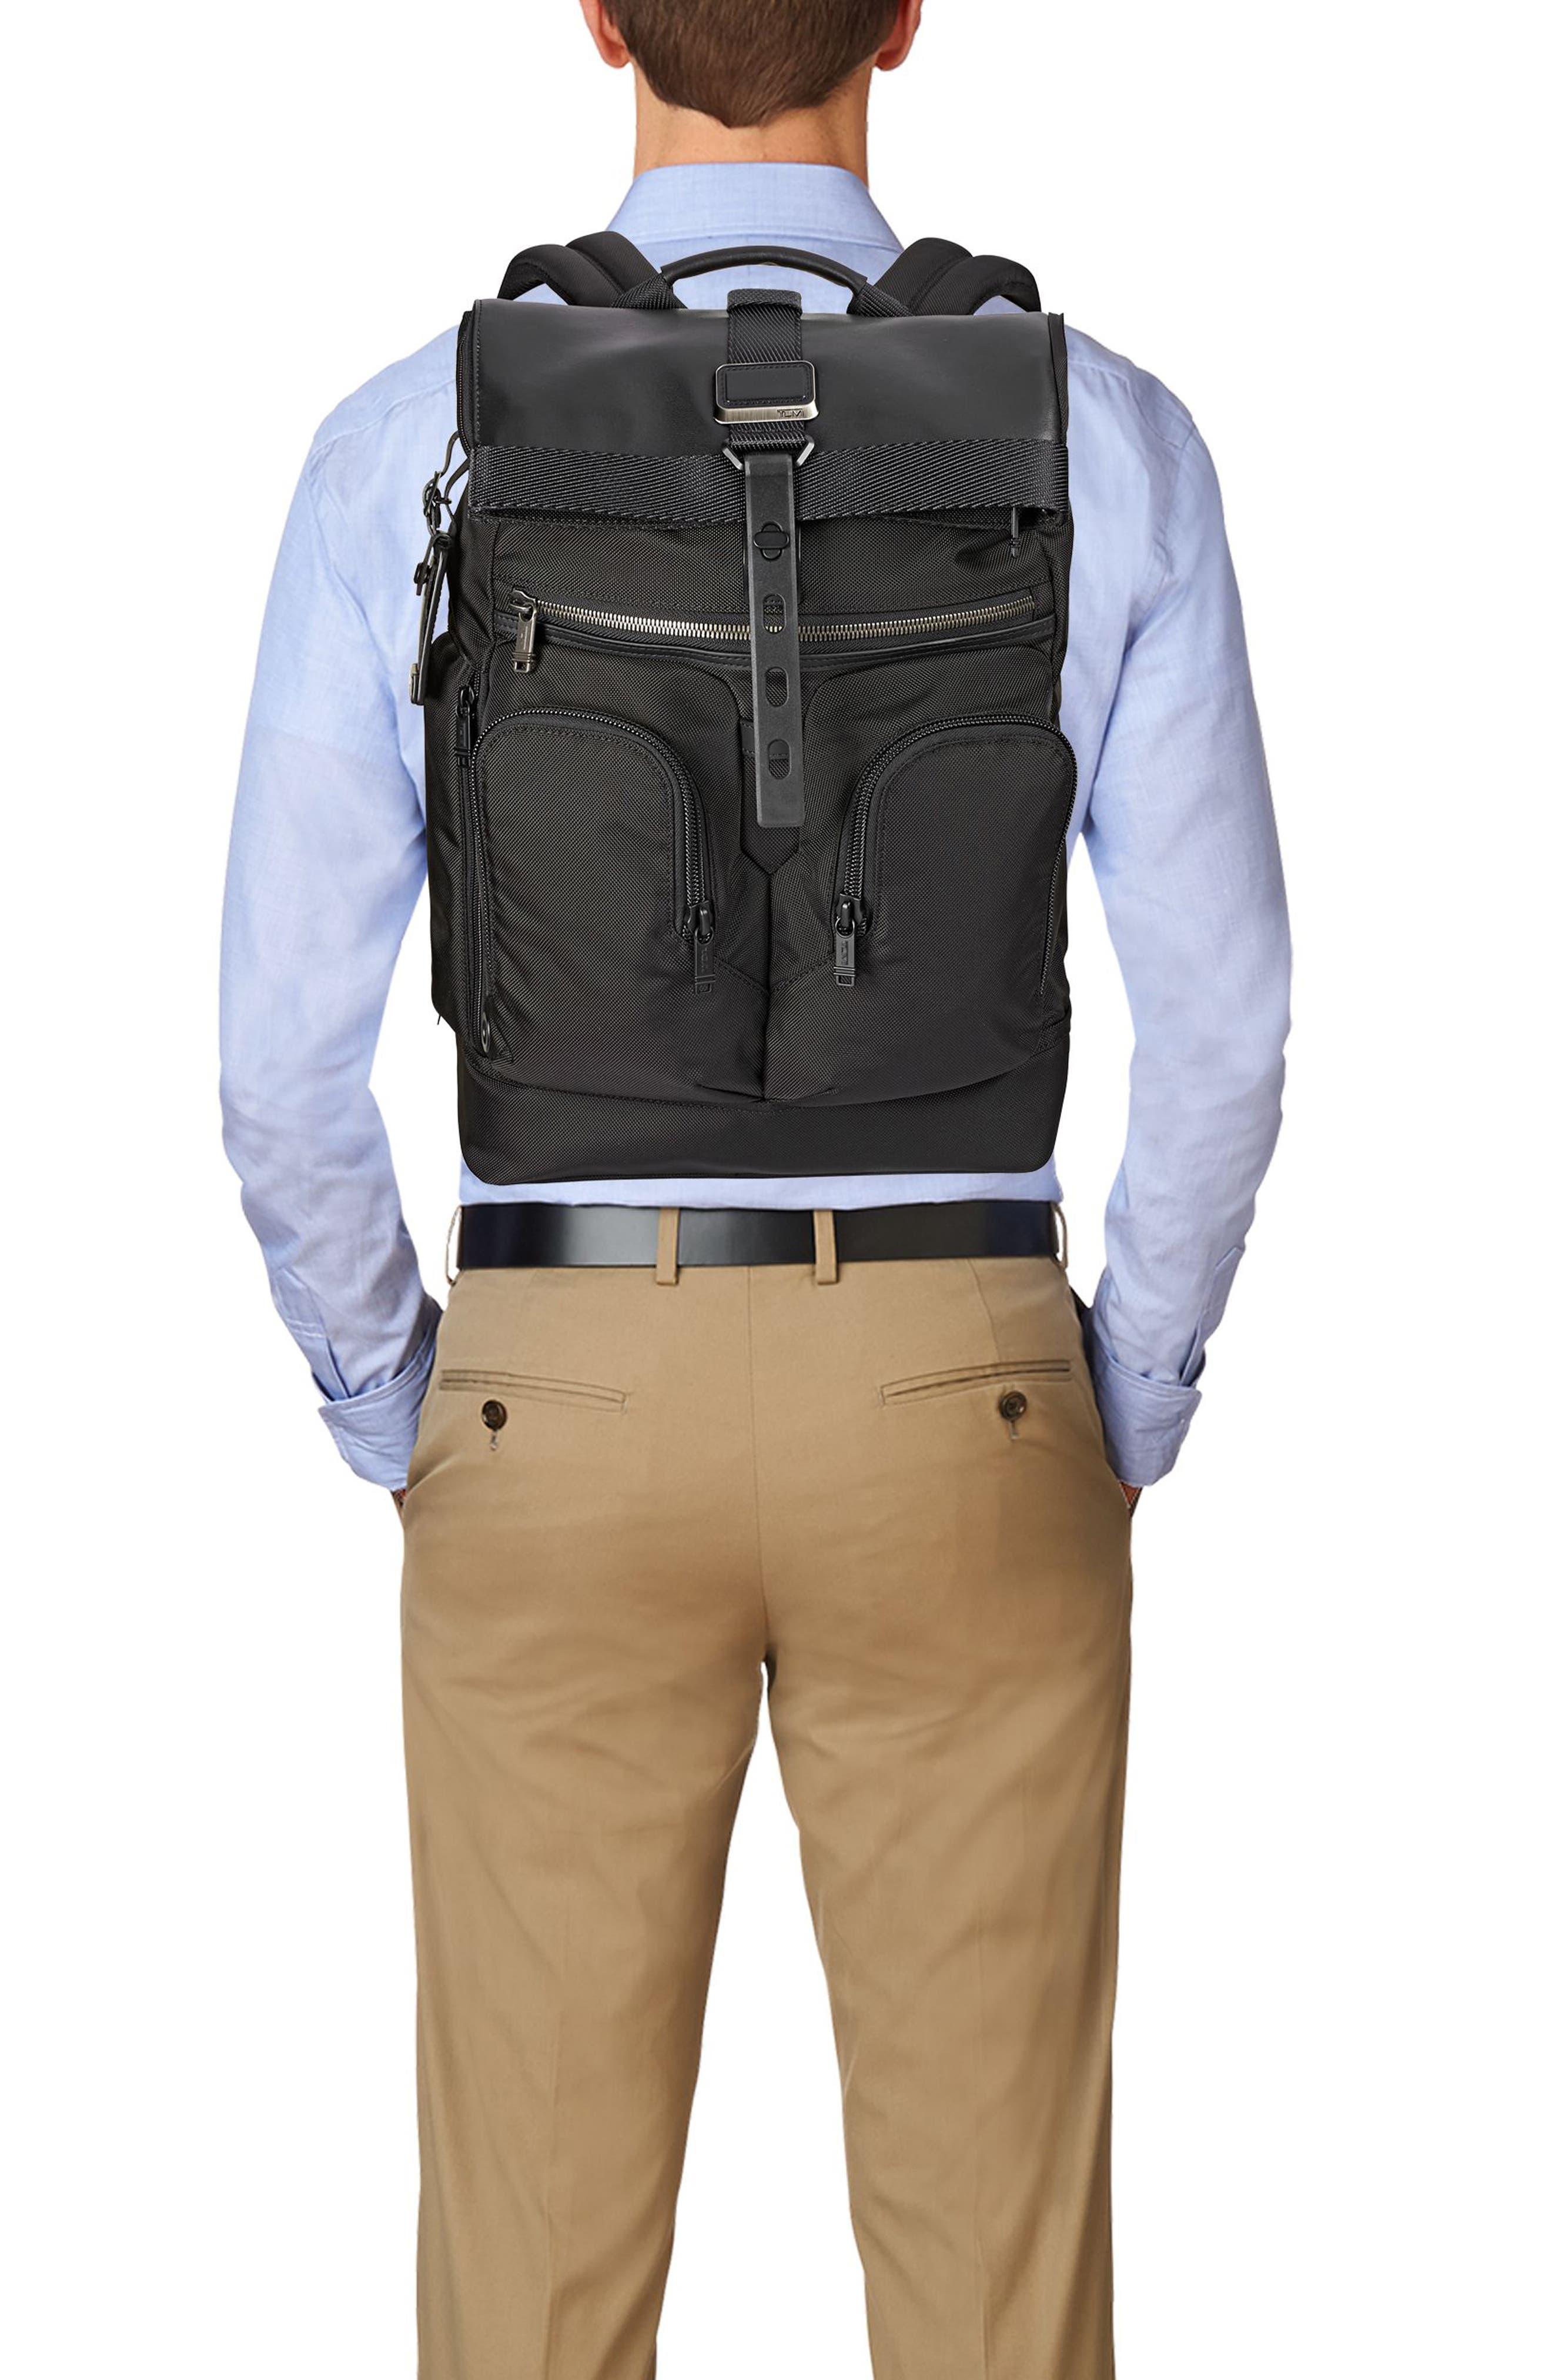 Alpha Bravo - London Backpack,                             Alternate thumbnail 6, color,                             BLACK